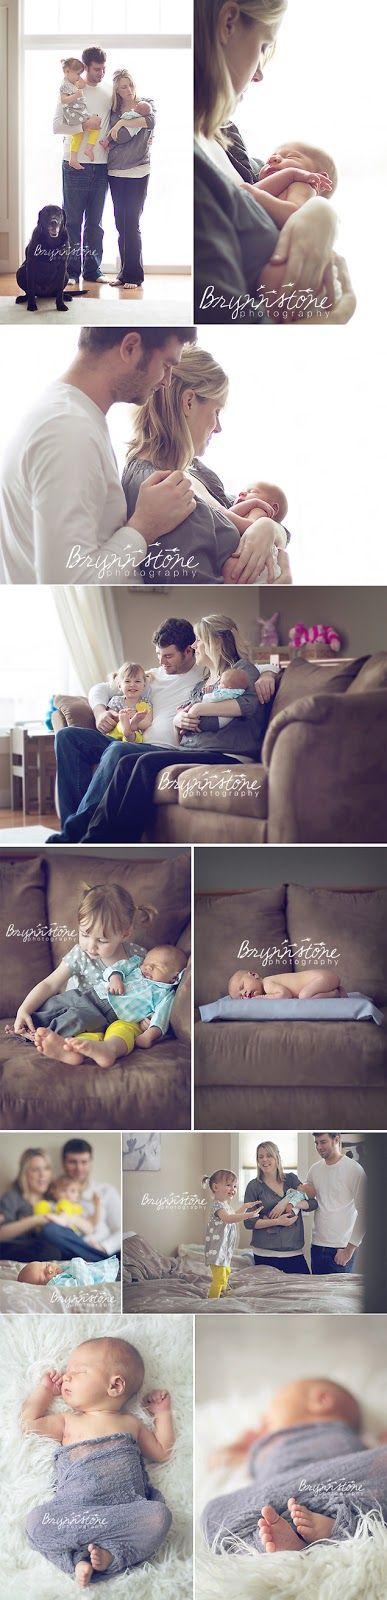 Newborn & Family Lifestyle Photography